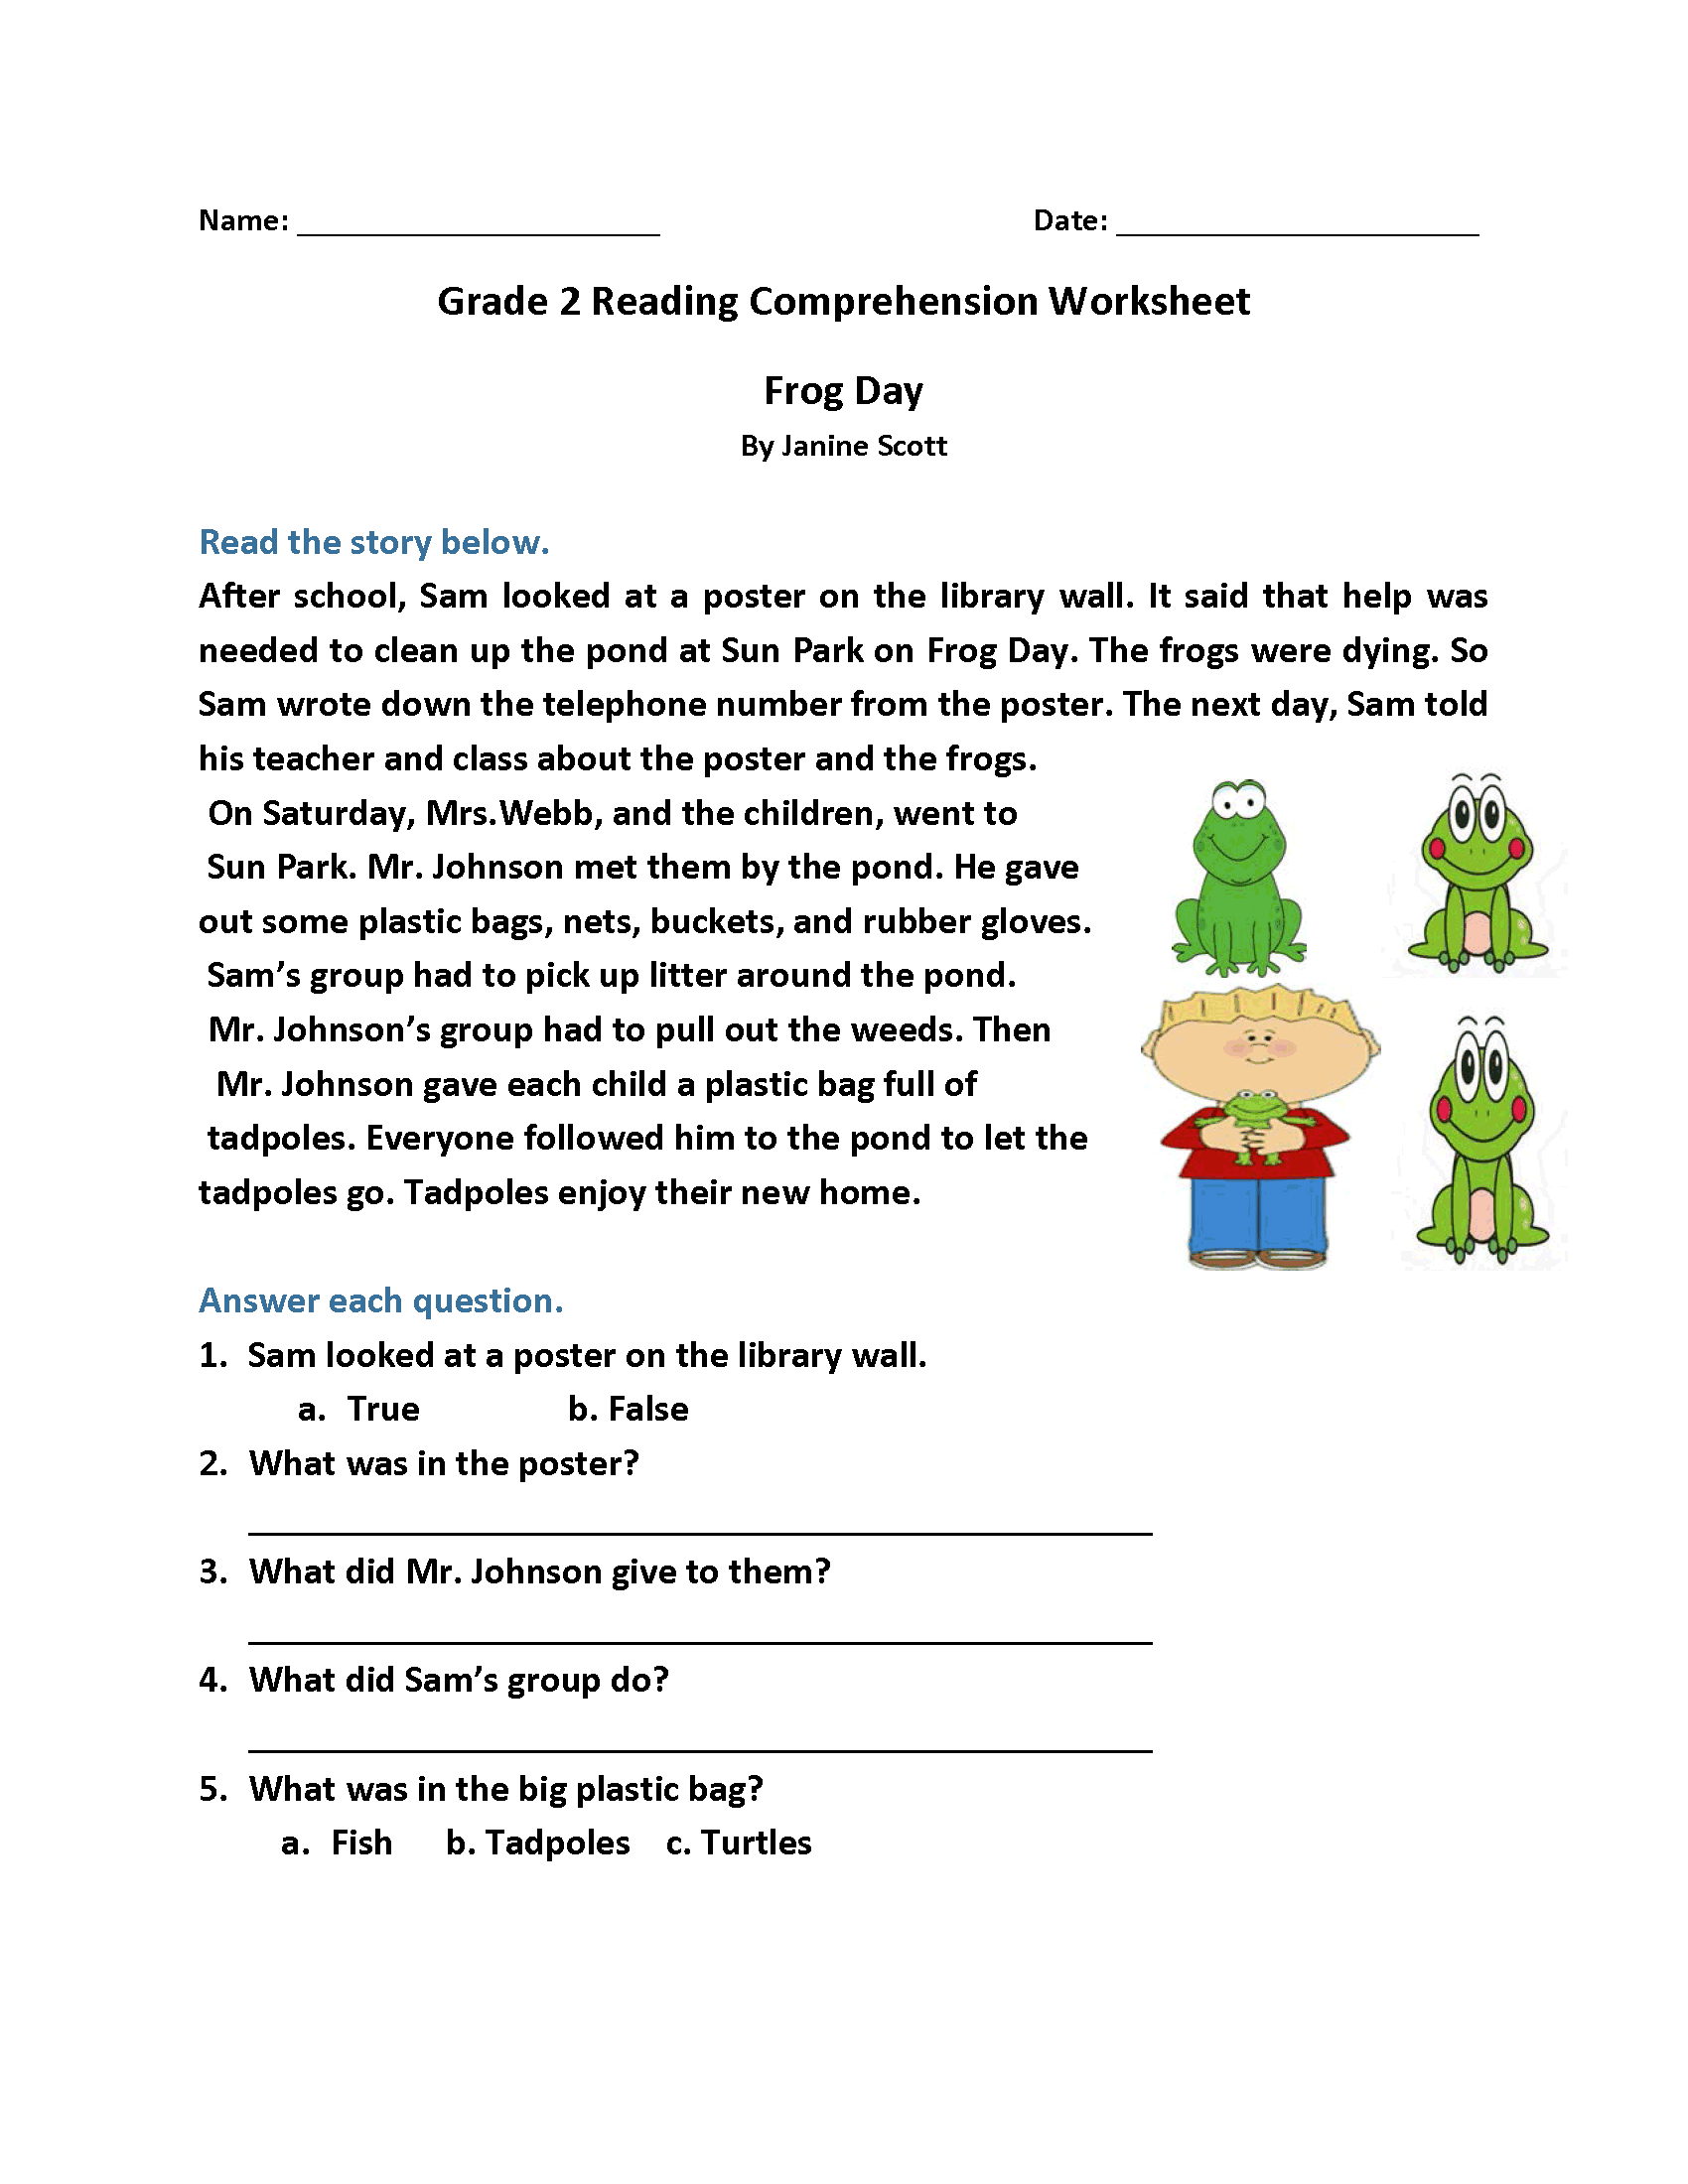 2Nd Grade Reading Worksheets  Best Coloring Pages For Kids Intended For Bible Reading Comprehension Worksheets